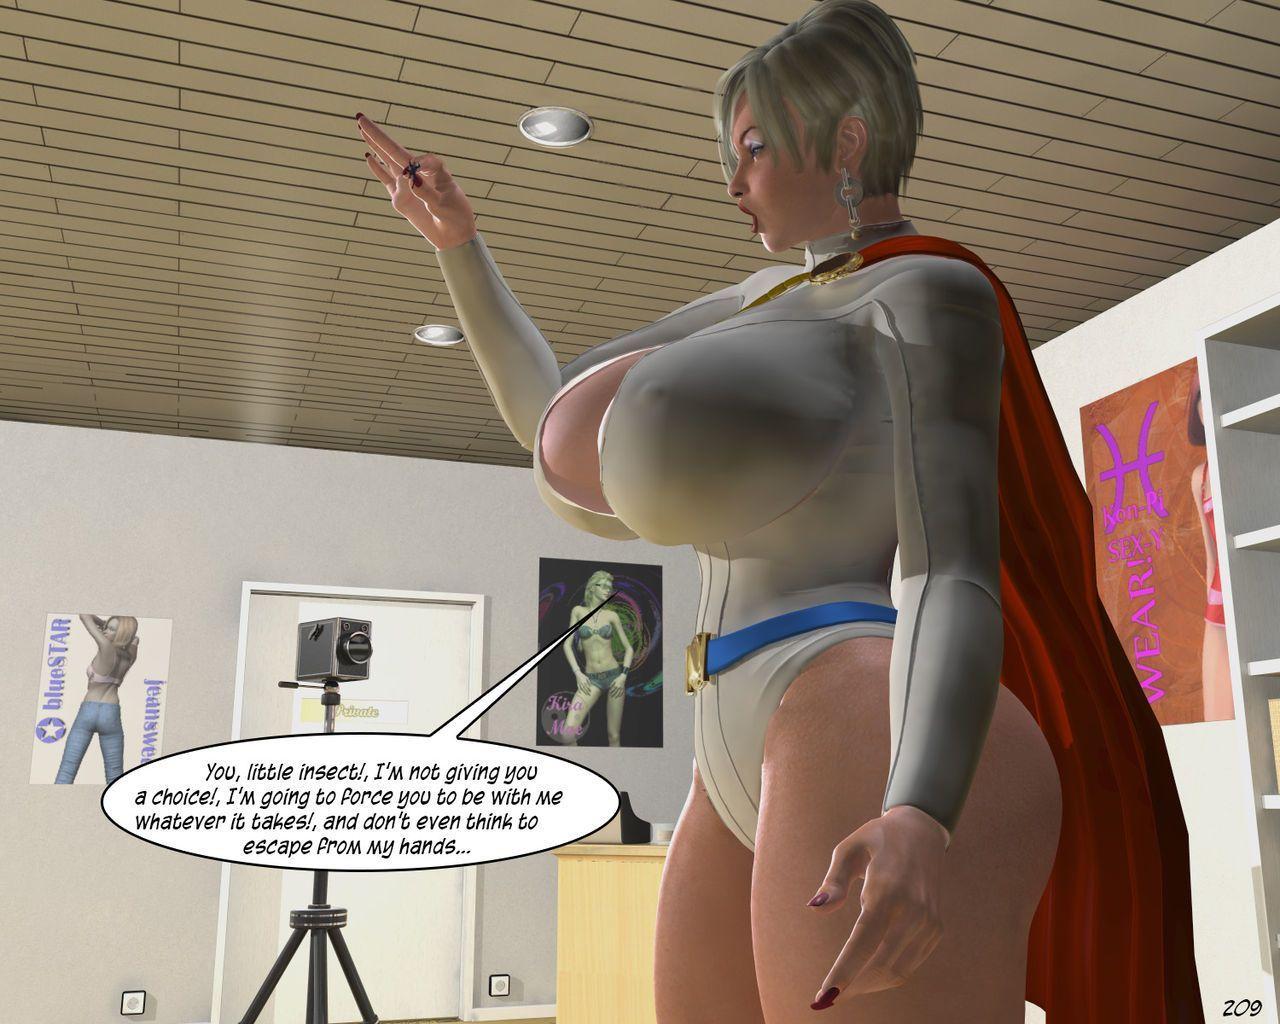 Wonder Woman Adventure - PhotoShrink! - part 11